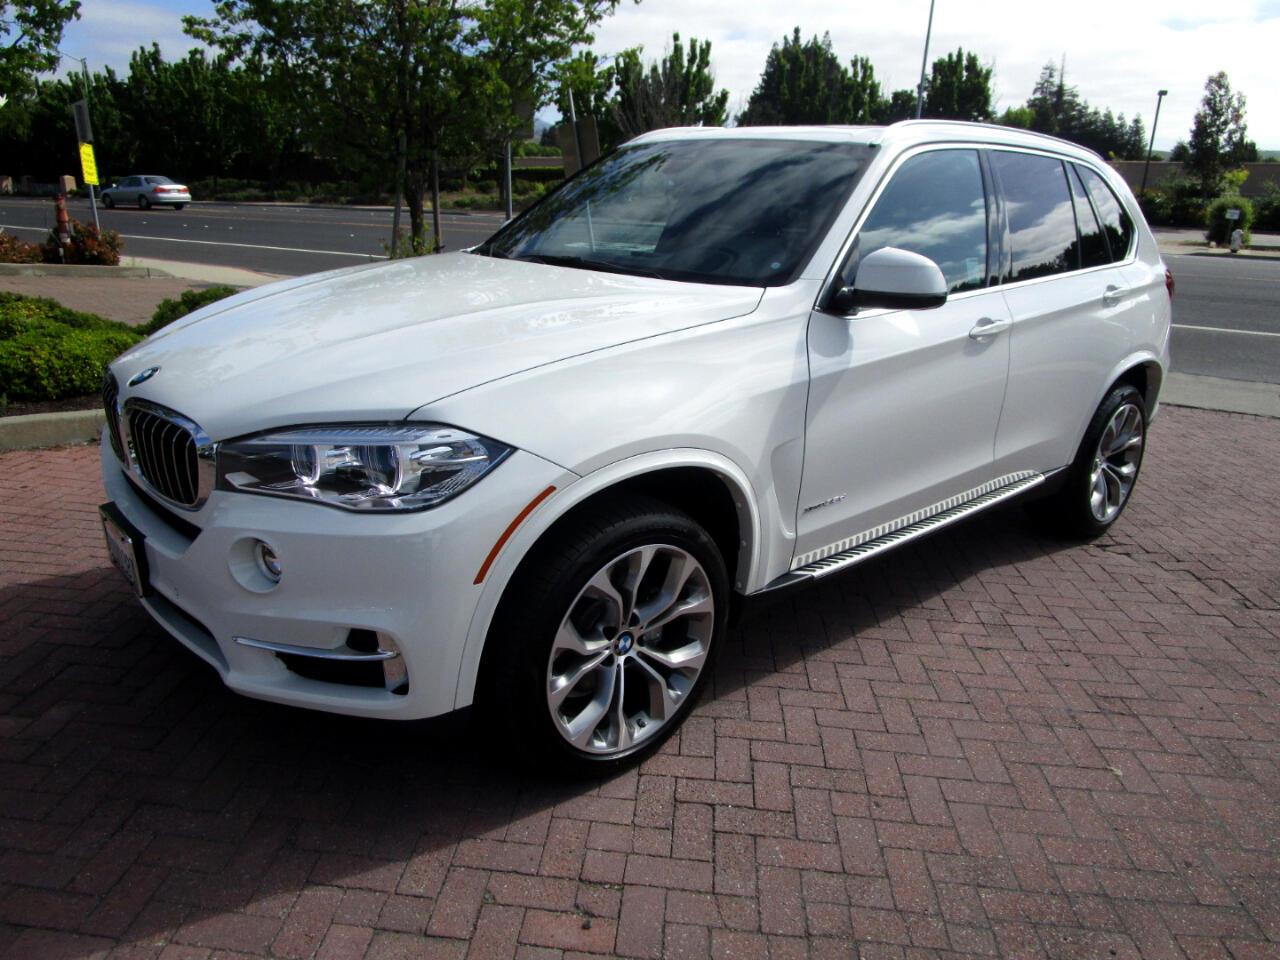 2018 BMW X5 XDRIVE35 DIESEL**PREMIUM*LUXURY*DRIVER ASSIST*PANO